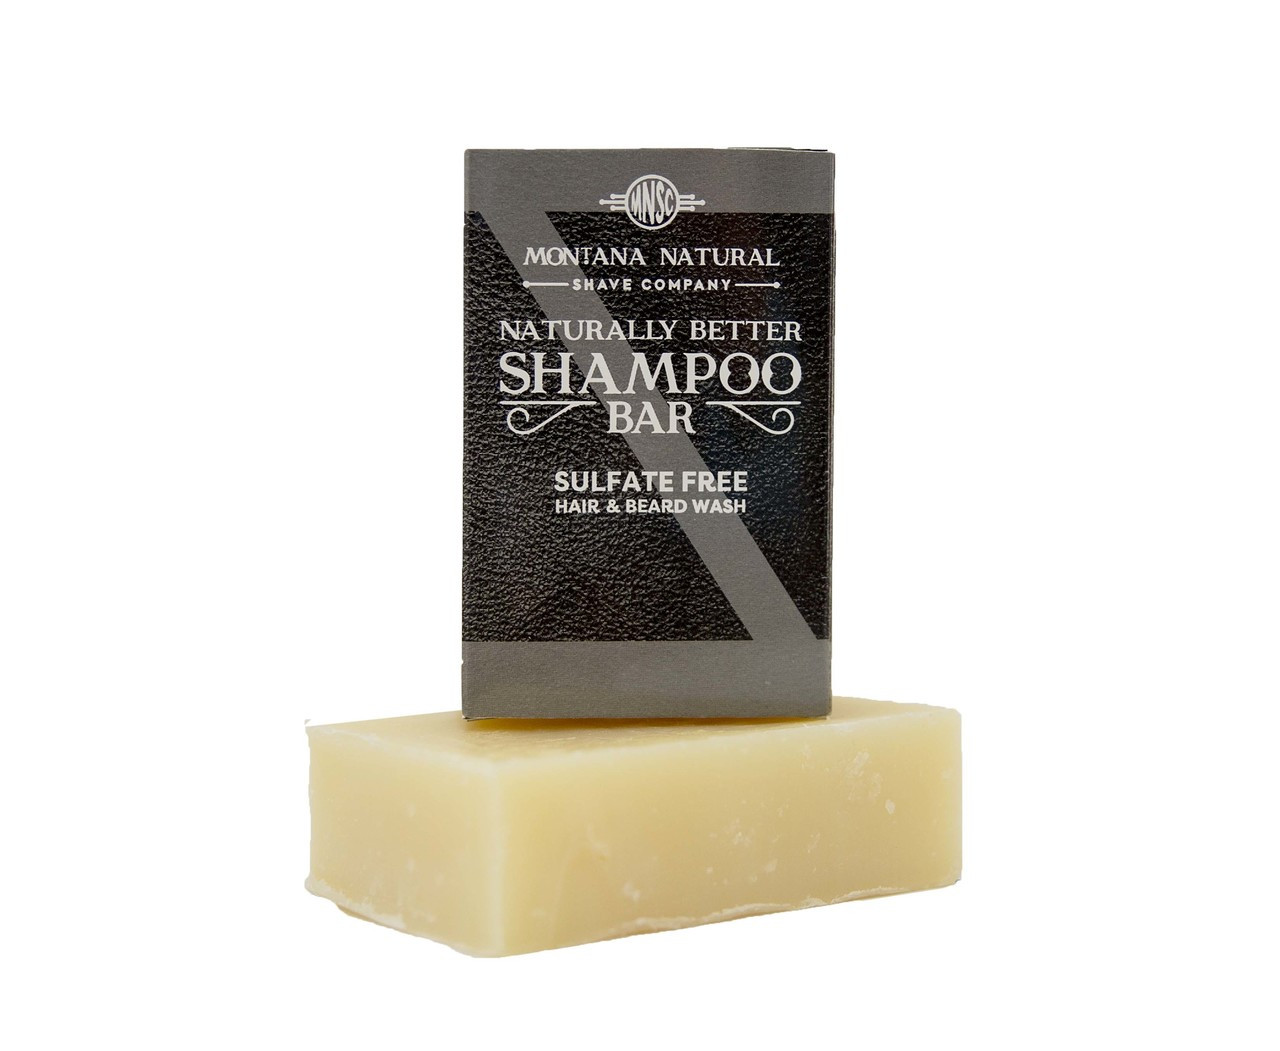 Tobacco Blossom Travel Friendly Solid Shampoo and Beard Wash - Montana Natural Shave Company